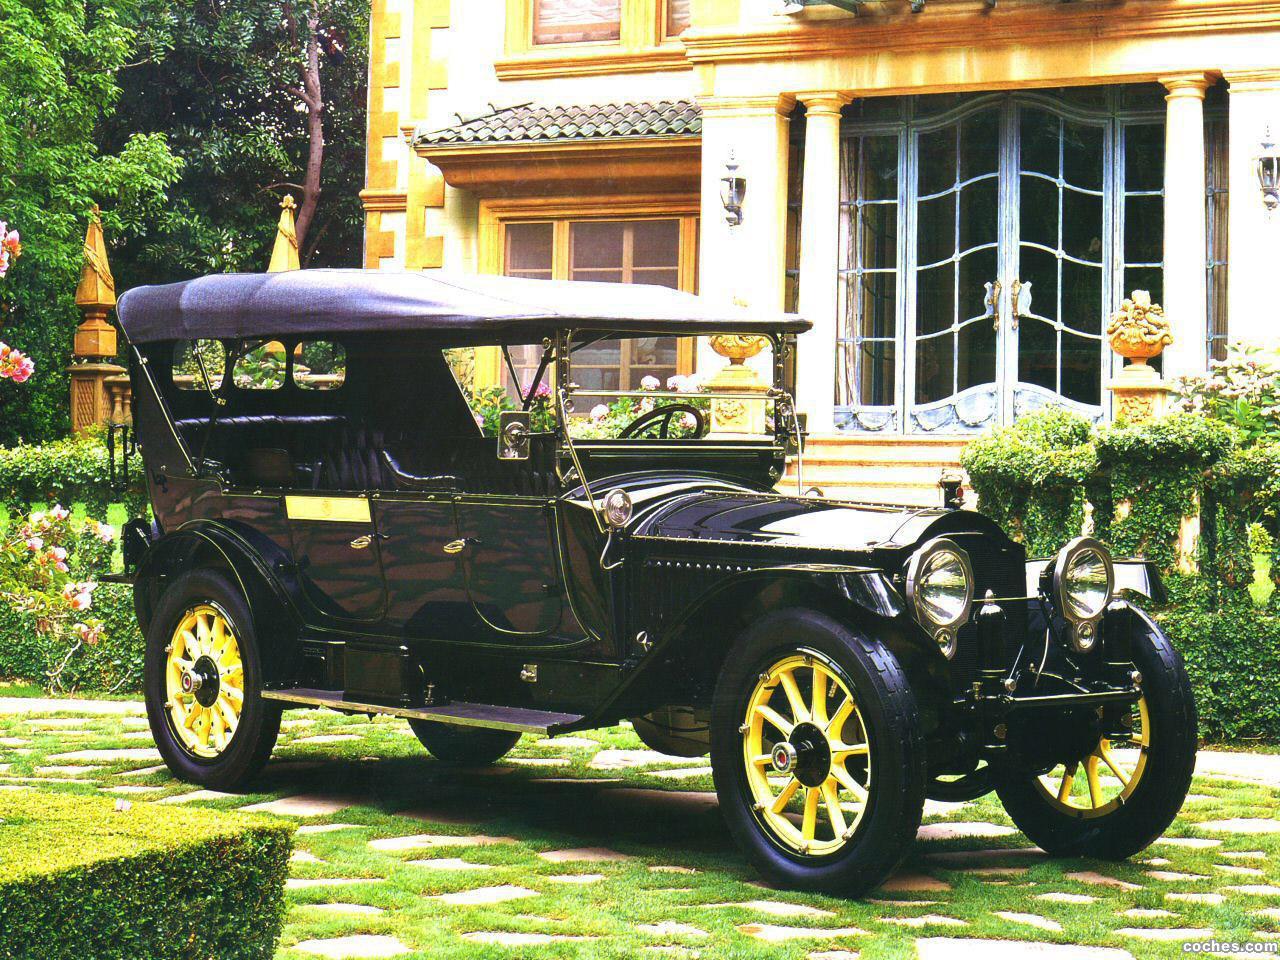 packard_six-touring-1915_r1